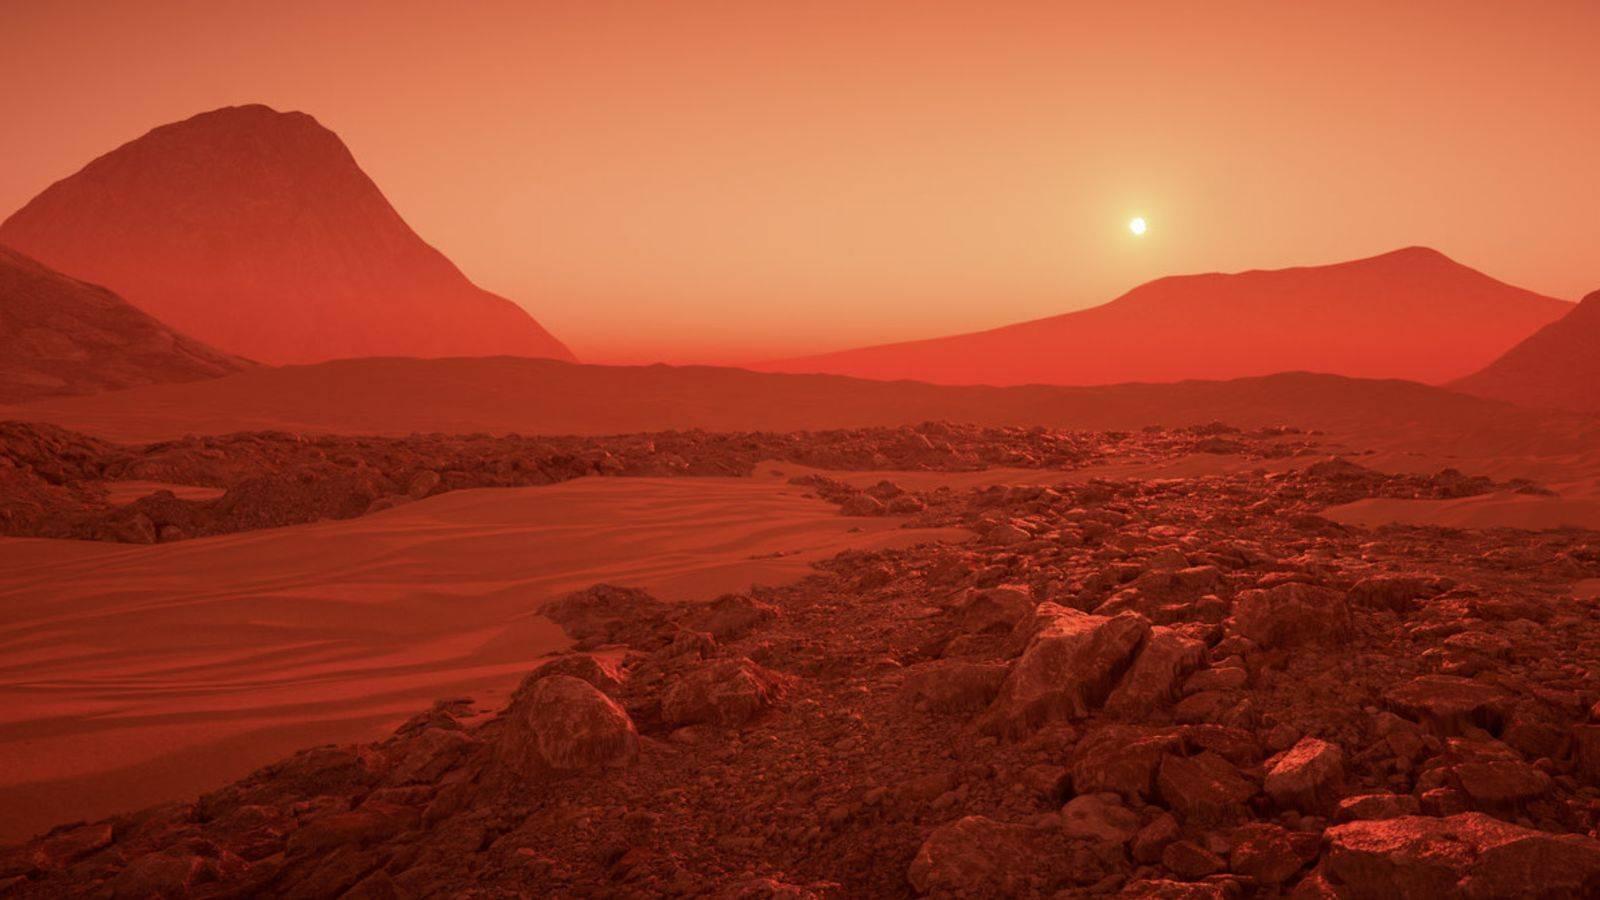 planeta marte hibernare esa